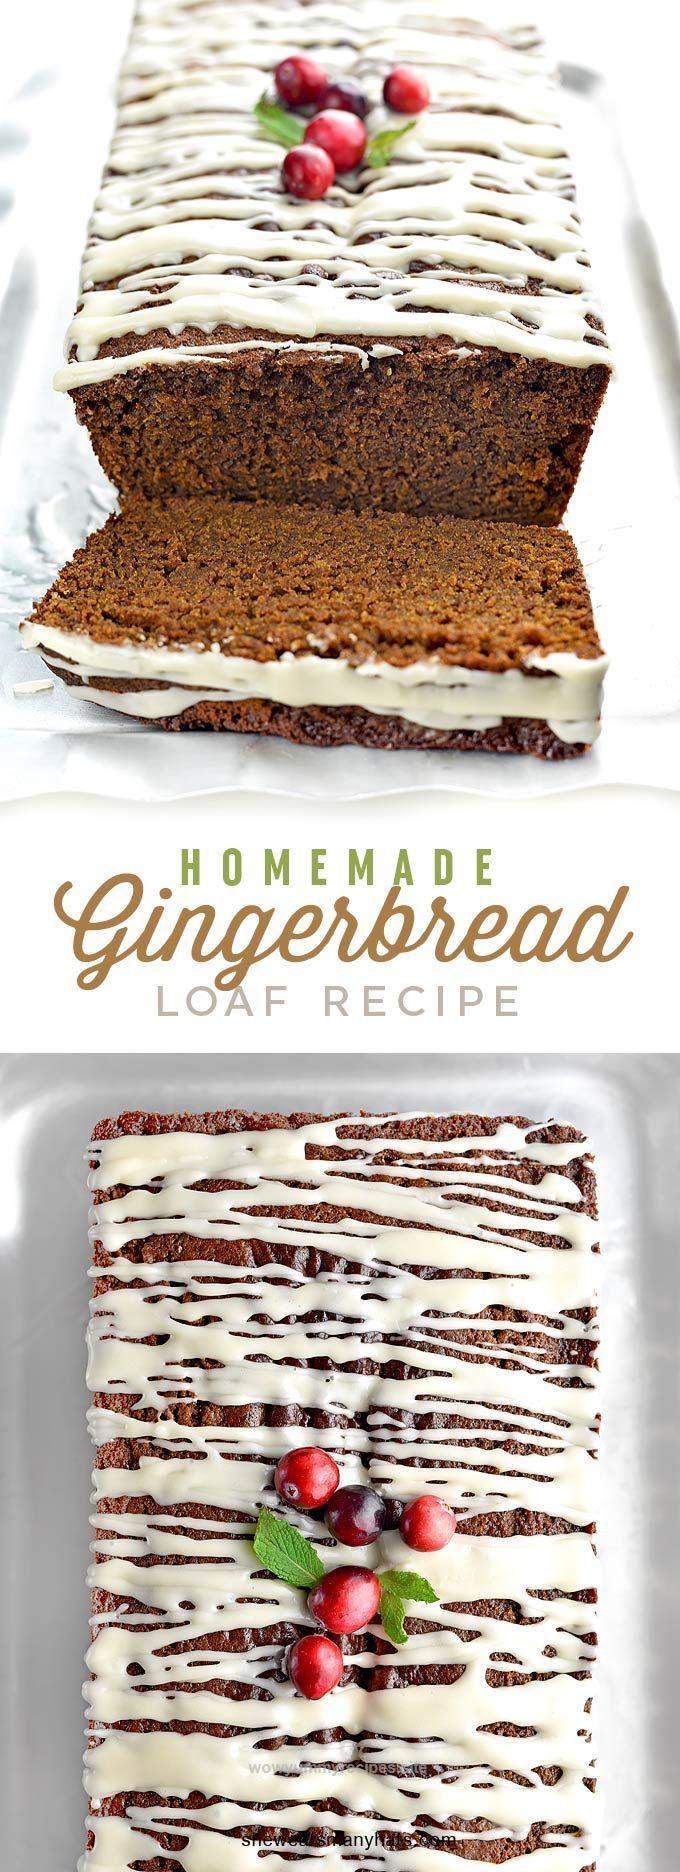 Homemade Gingerbread Loaf Recipe Gingerbread loaf recipe